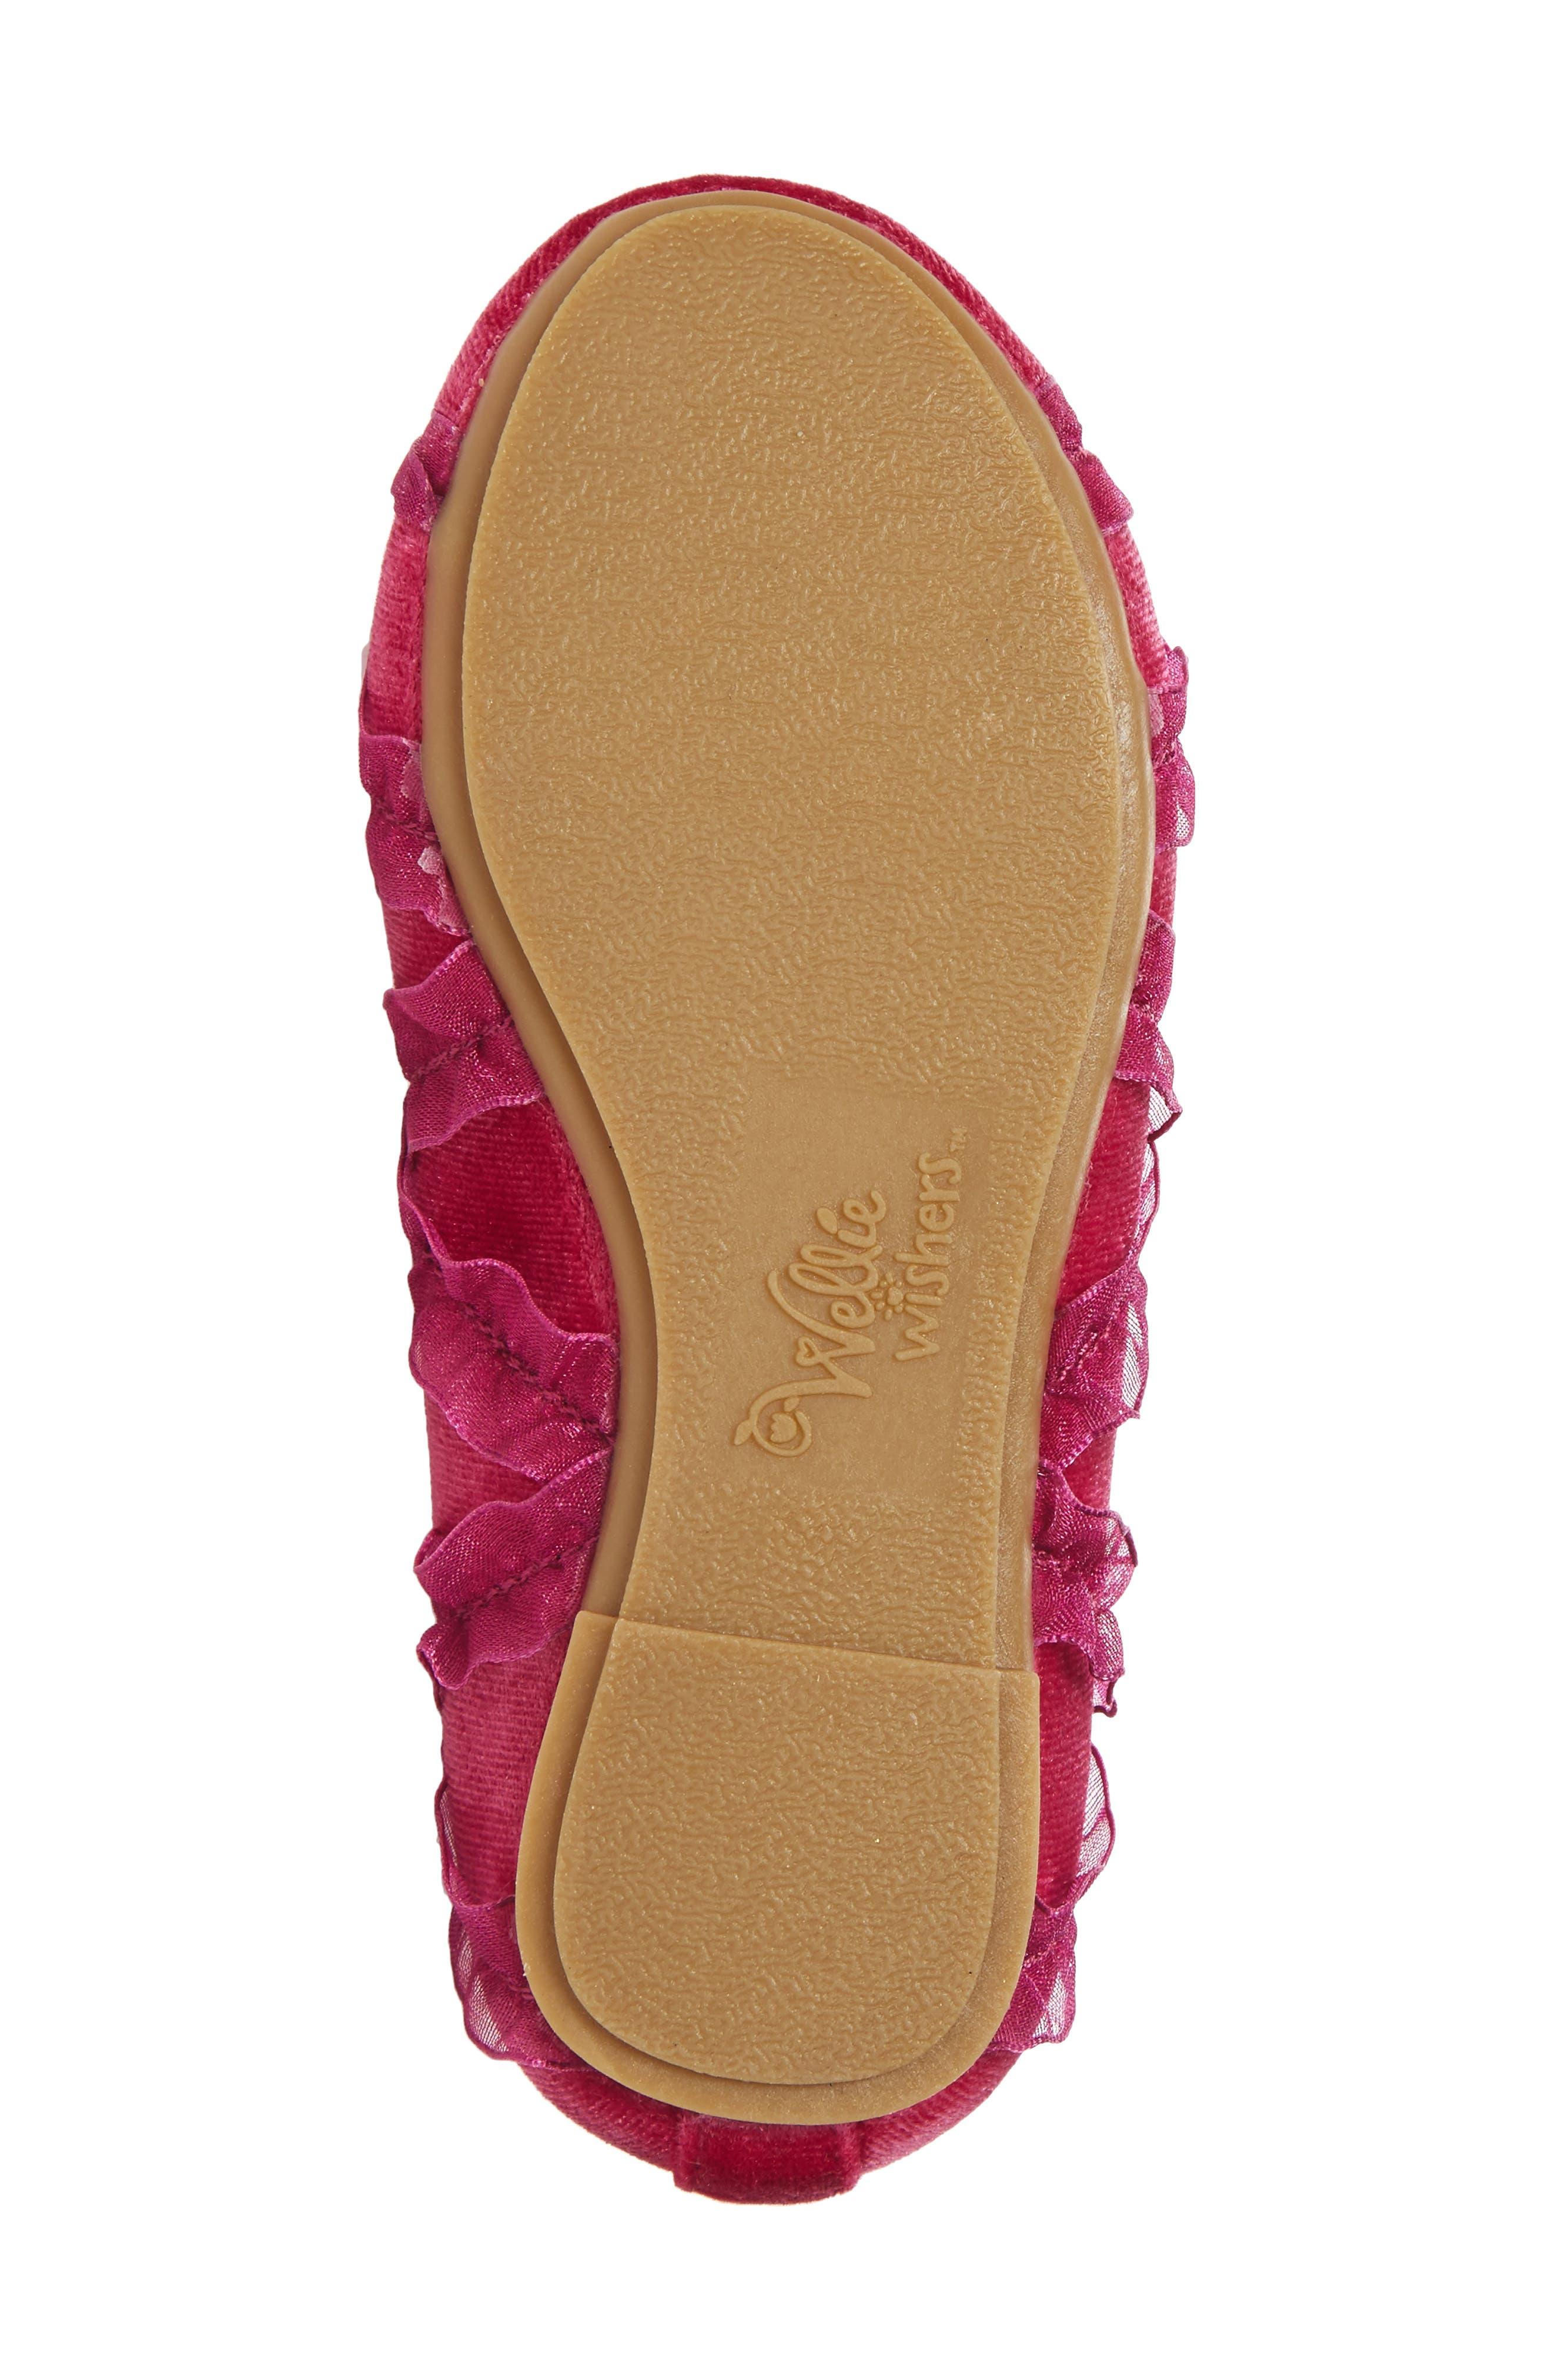 Emerson Ankle Strap Ballet Flat,                             Alternate thumbnail 6, color,                             650